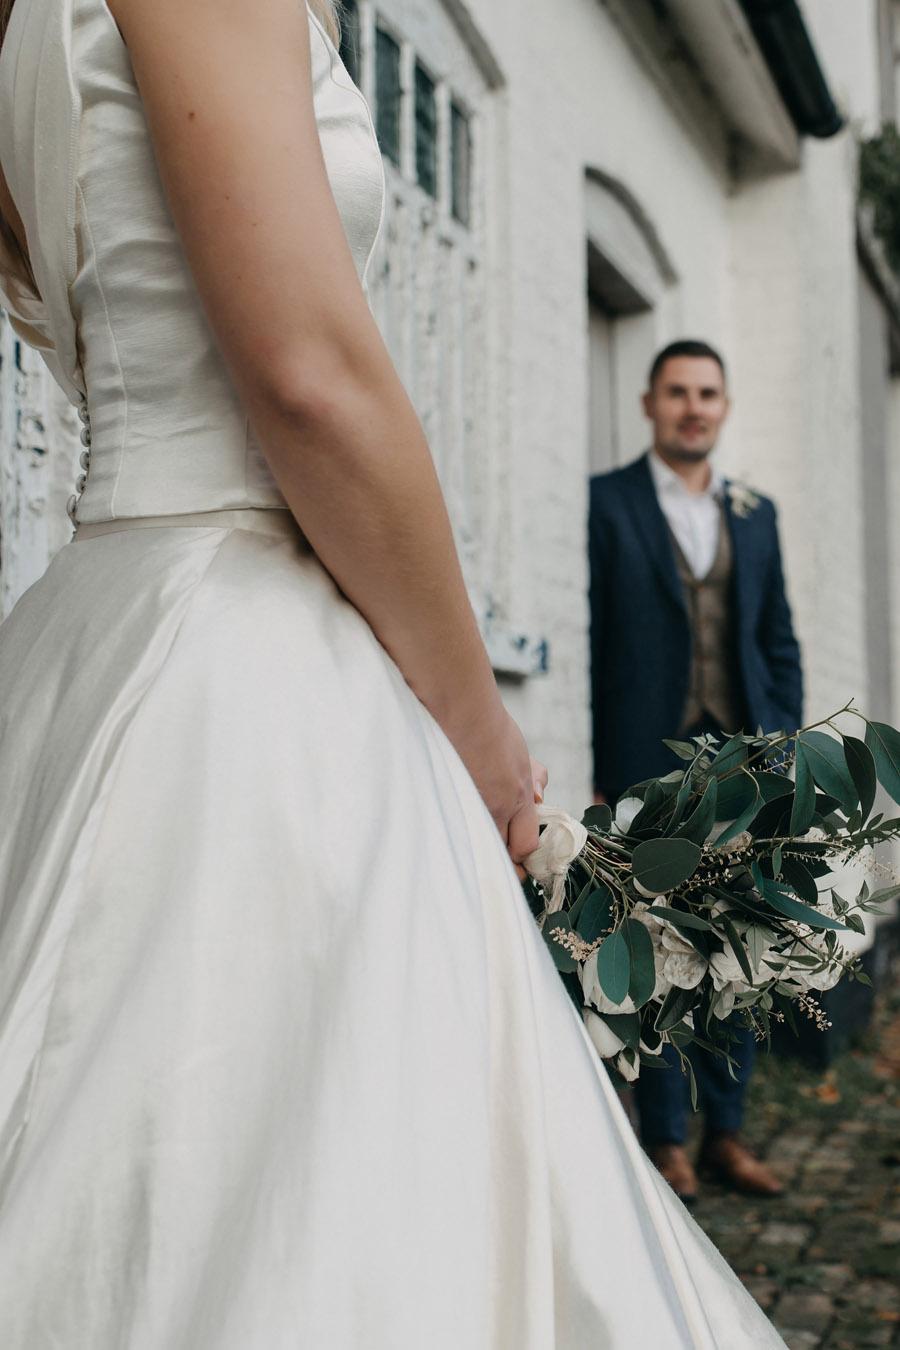 Eco vegan wedding style inspiration with Sanyukta Shrestha, credit KMGS Photography (23)